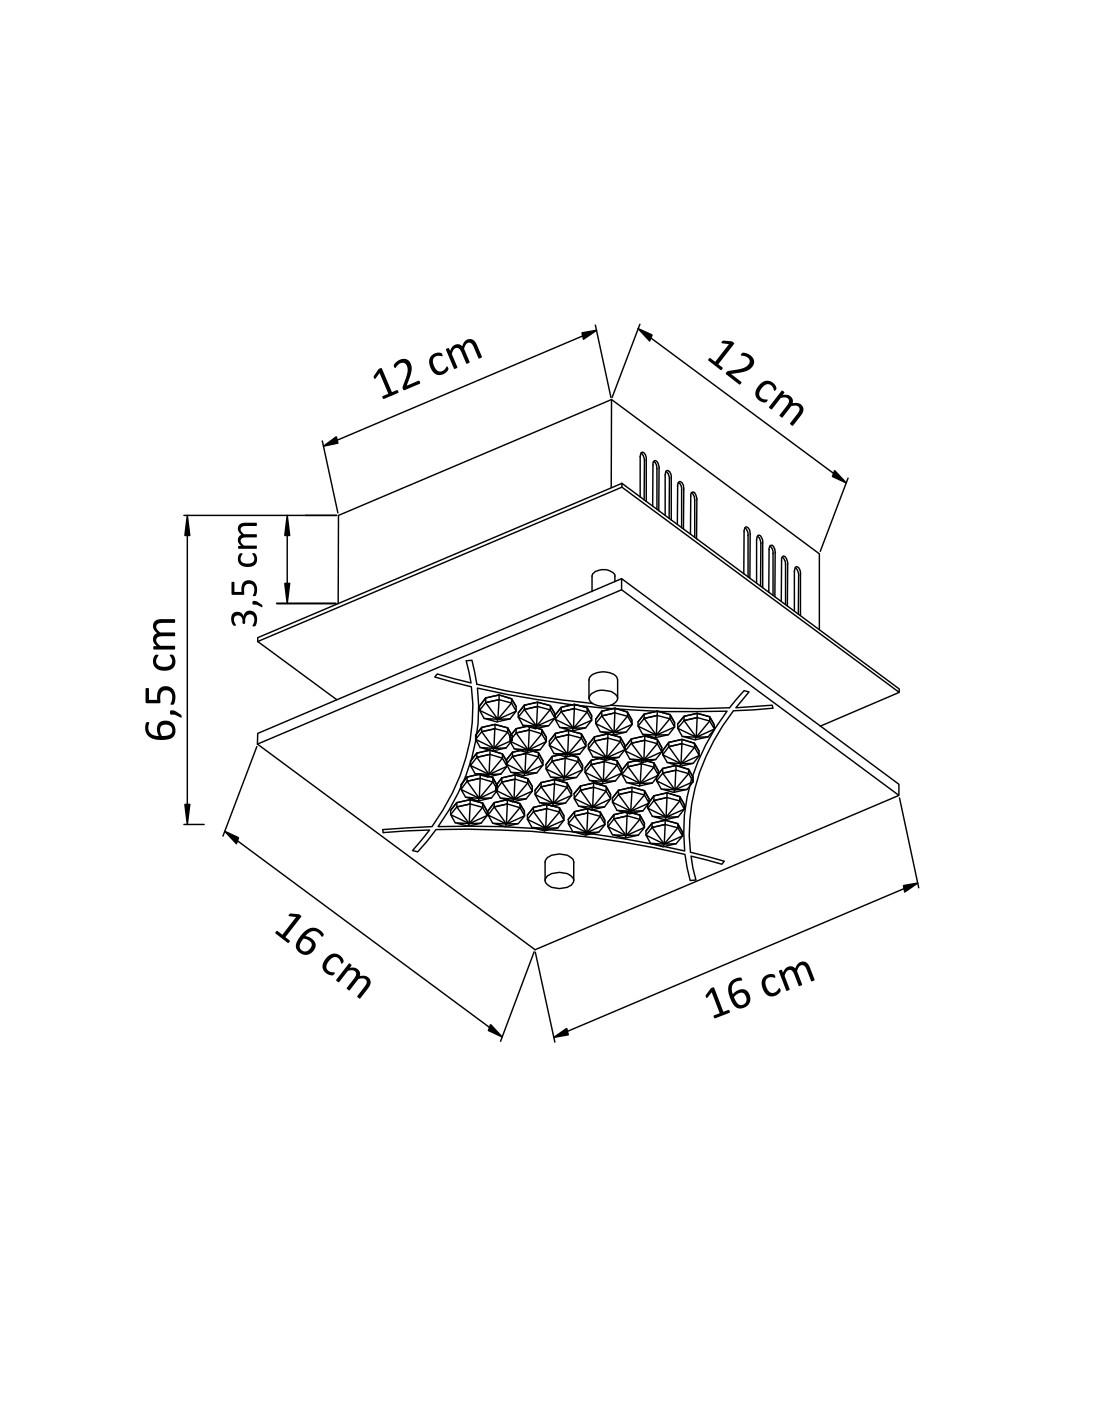 Led Semi Flushmount Ceiling Light